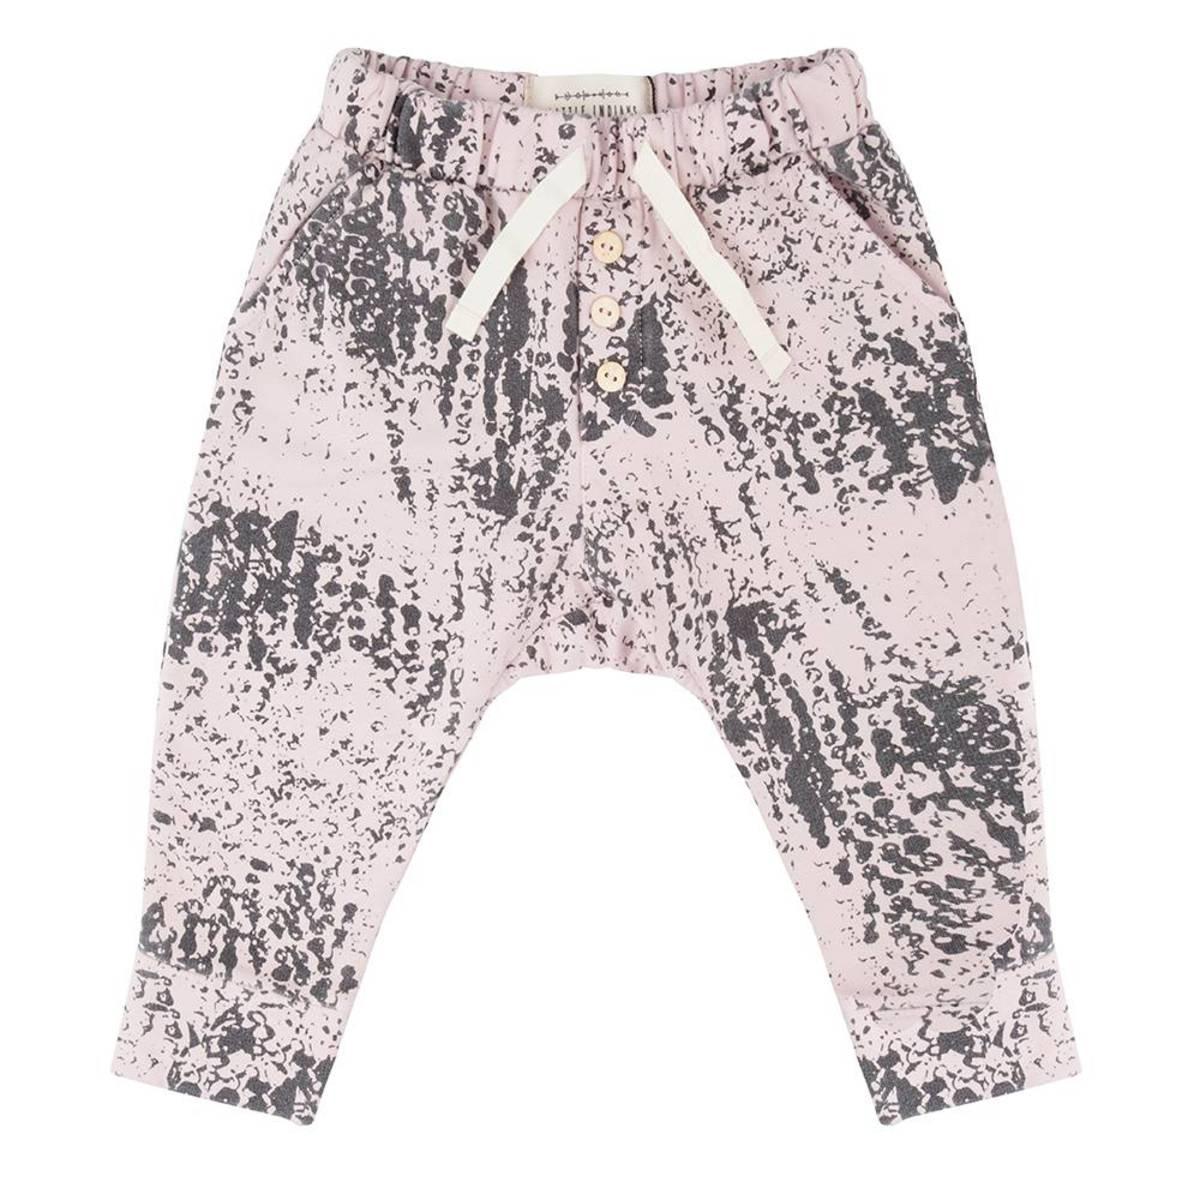 Bas Bébé Pantalon World Broek Rose - 12/18 mois Pantalon World Broek Rose - 12/18 mois